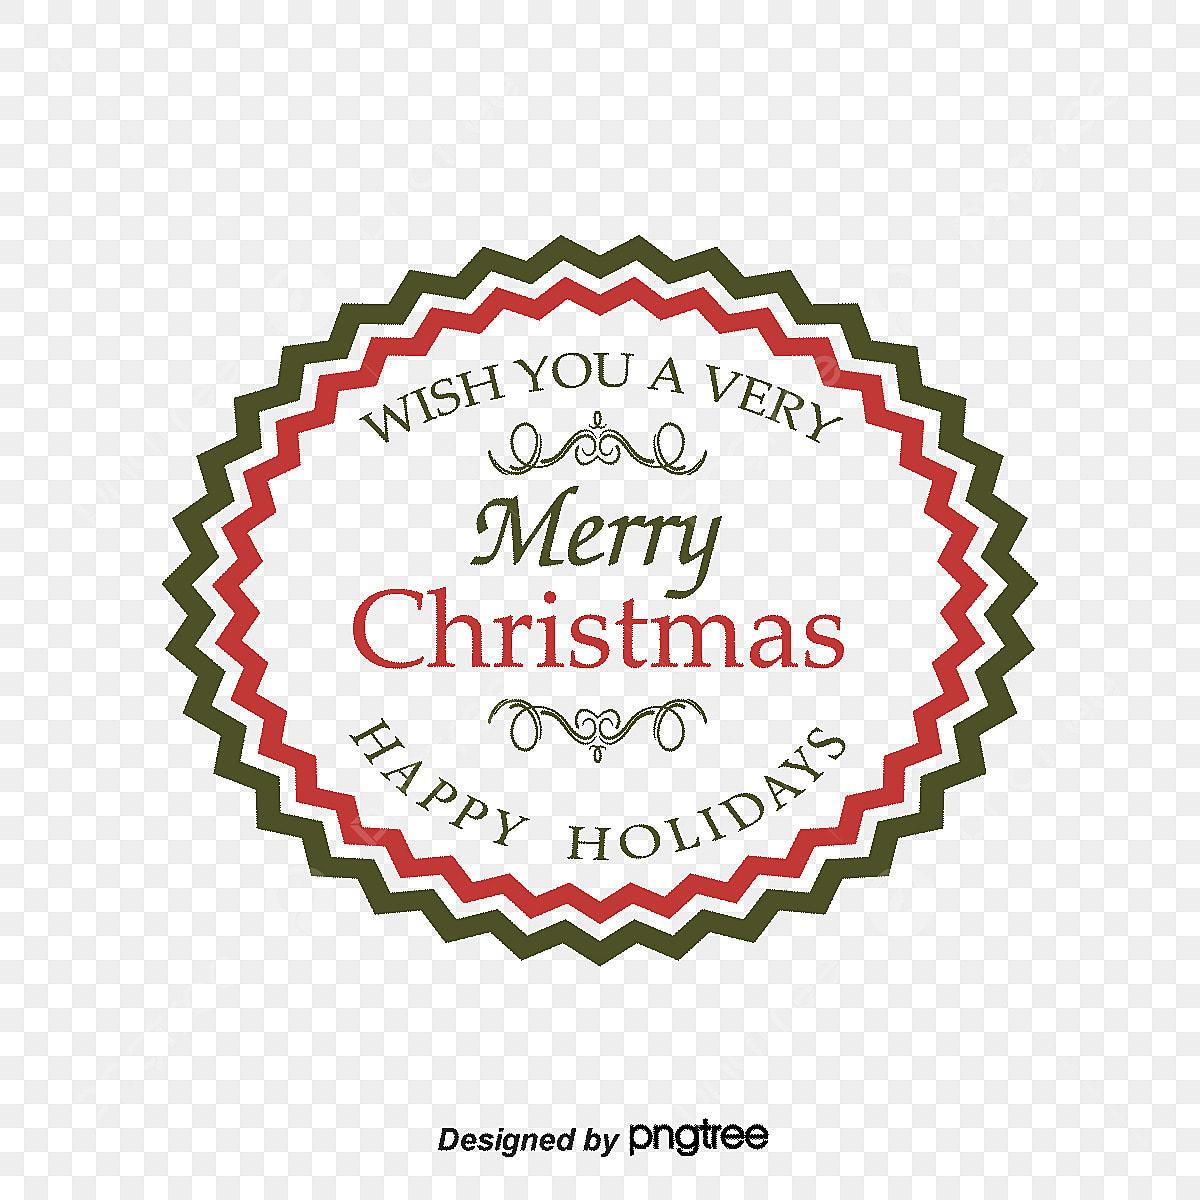 Merry Christmas Word Art Png.Merry Christmas Wordart Vector Christmas Vector Christmas